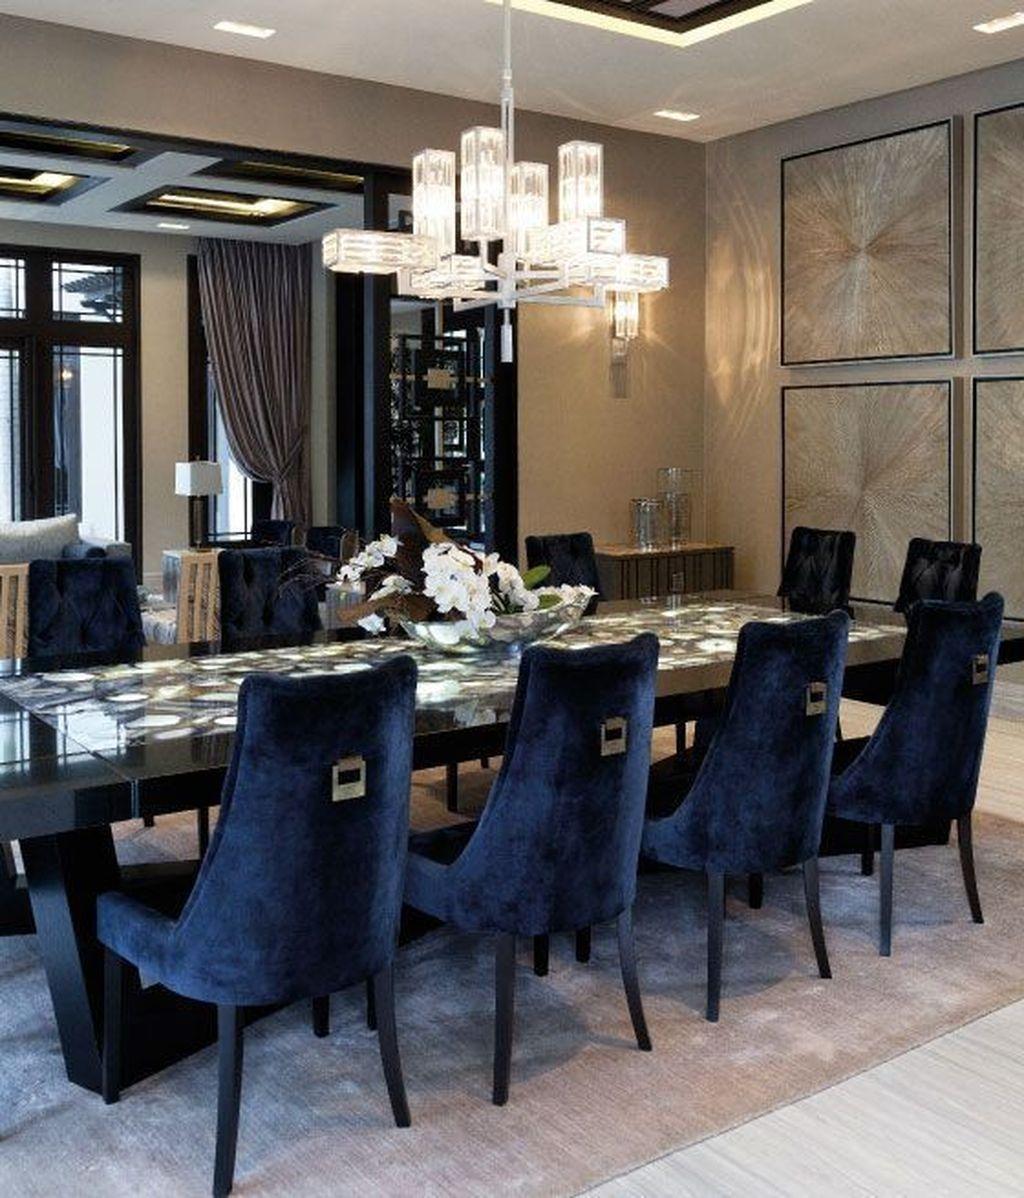 36 Admirable Scandinavian Dining Room Design Ideas Scandinavian Dining Room Dining Room Contemporary Dining Room Design